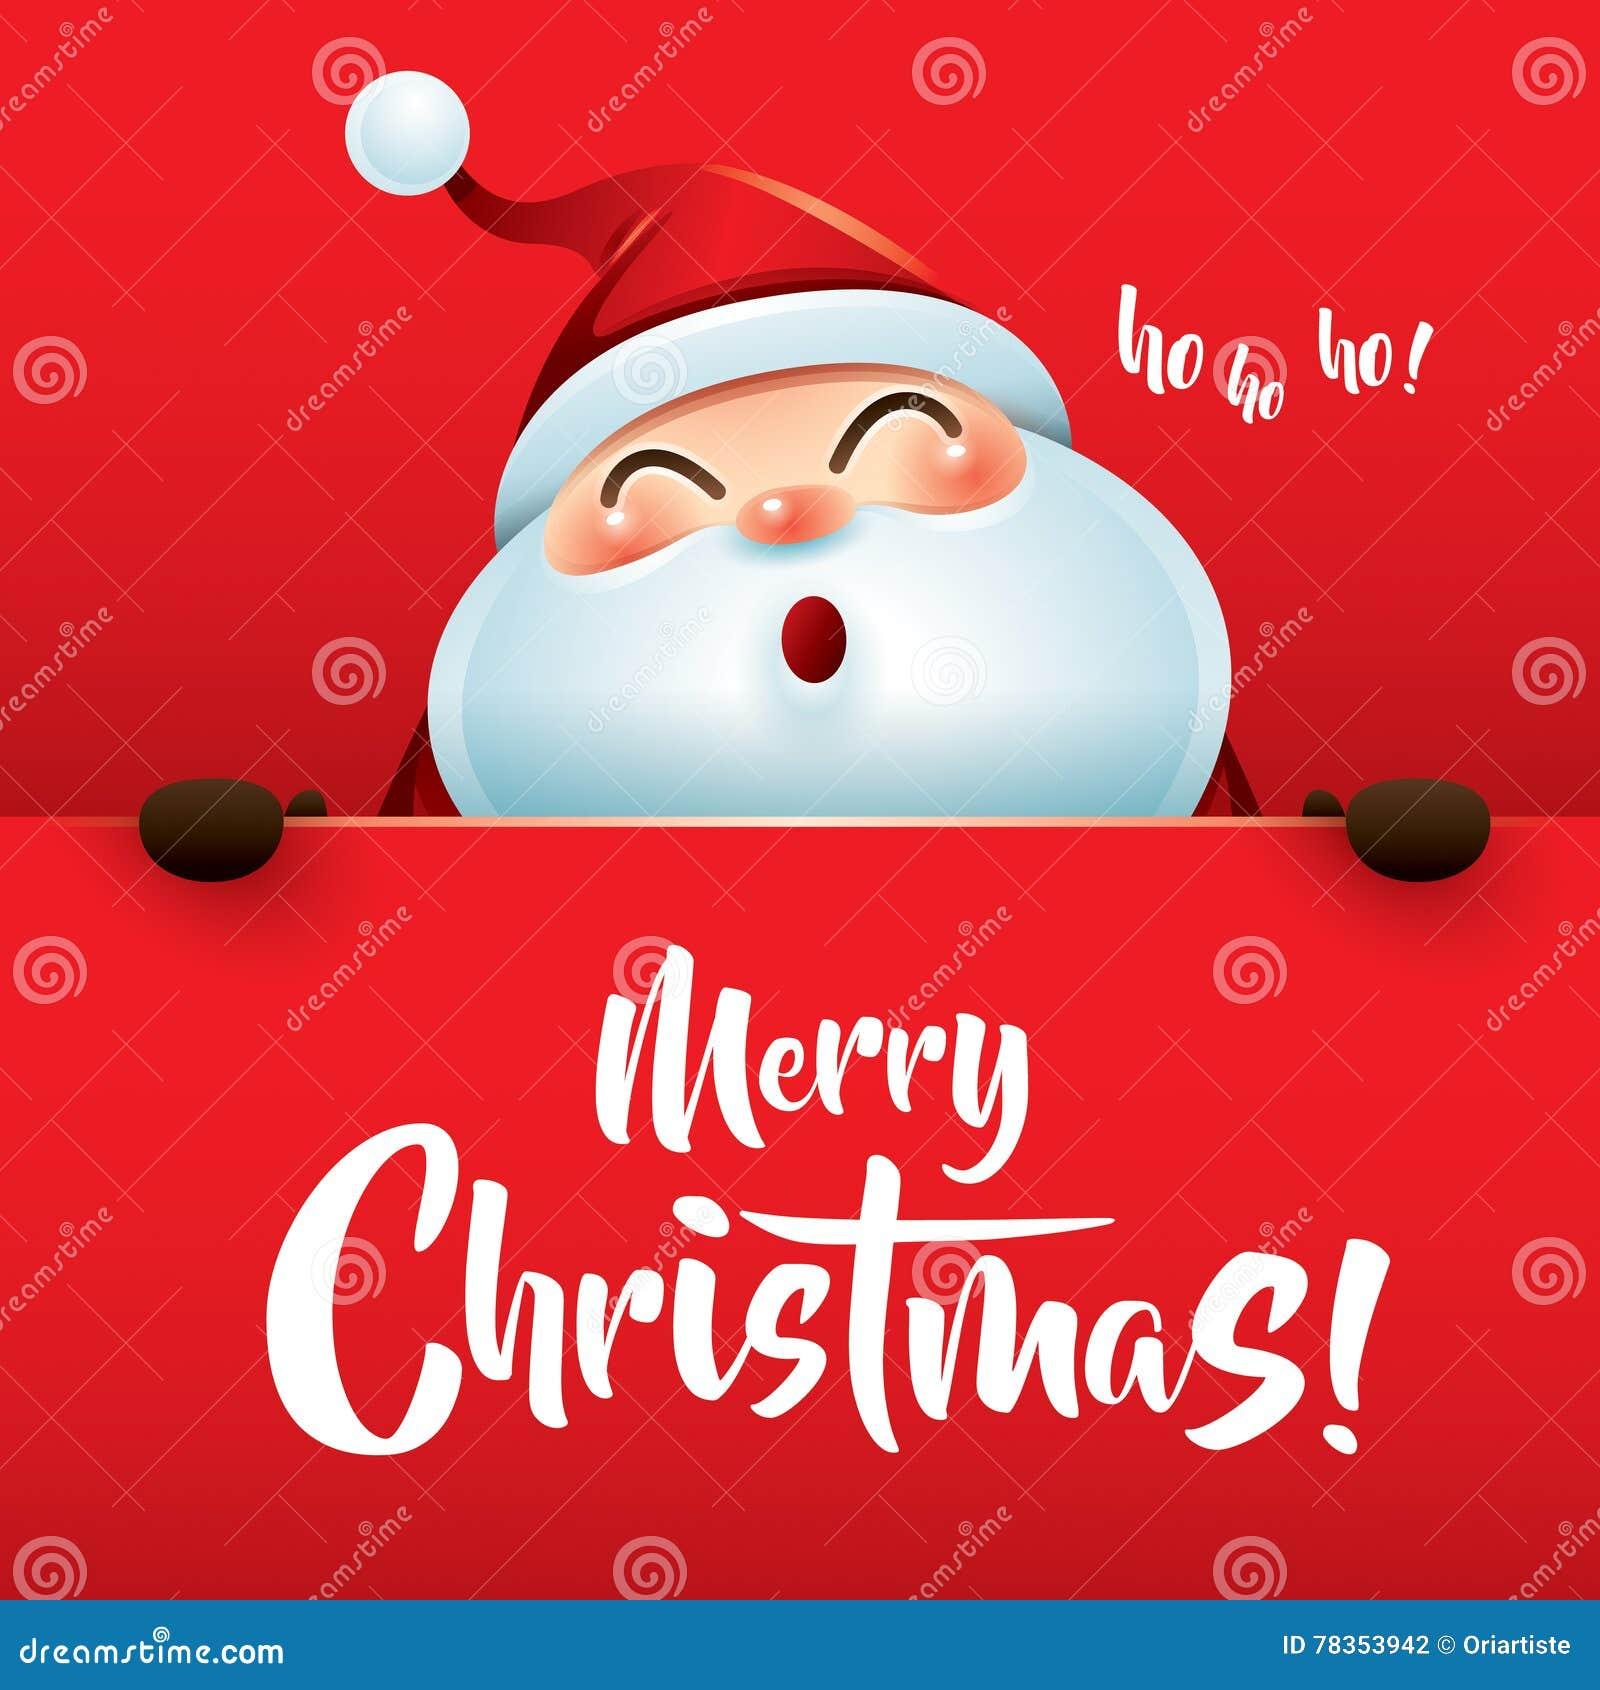 ho ho ho merry christmas - Hohoho Merry Christmas